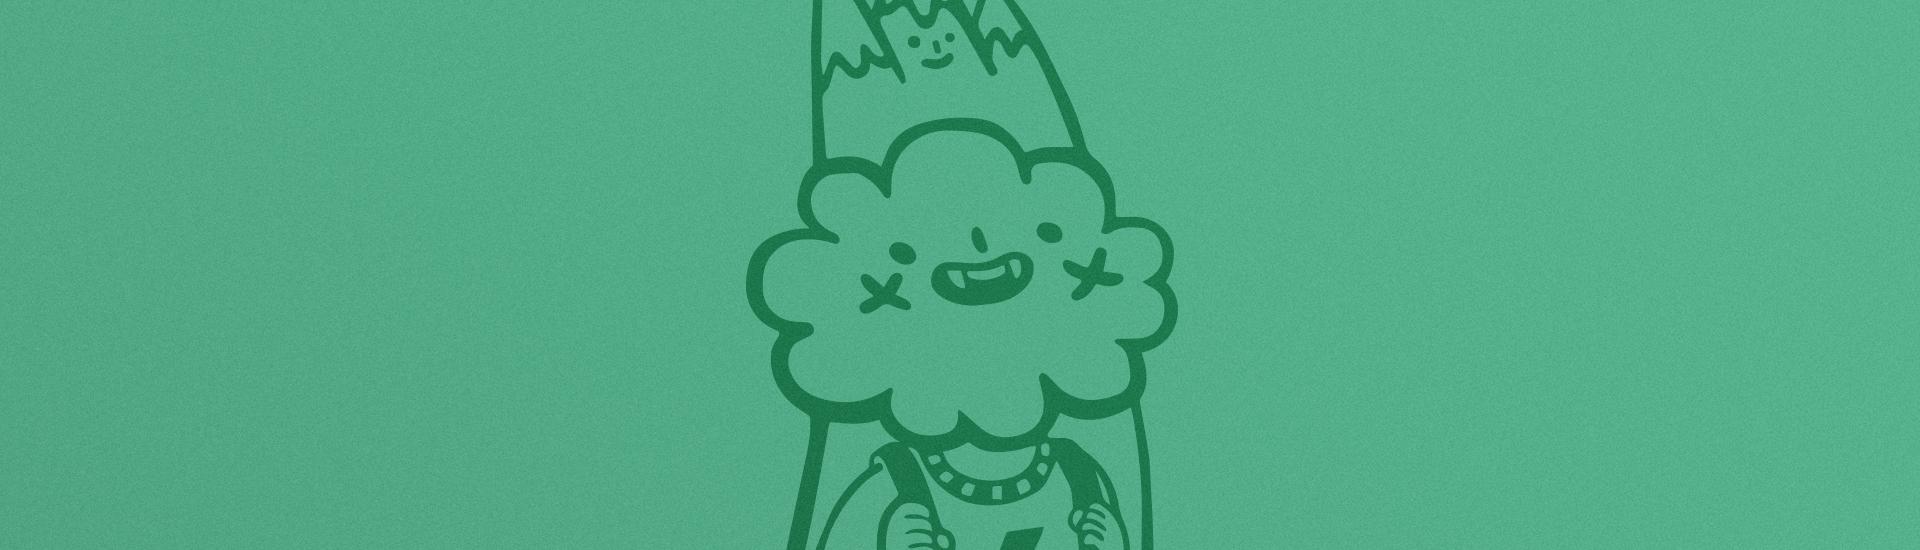 Enfant nuage